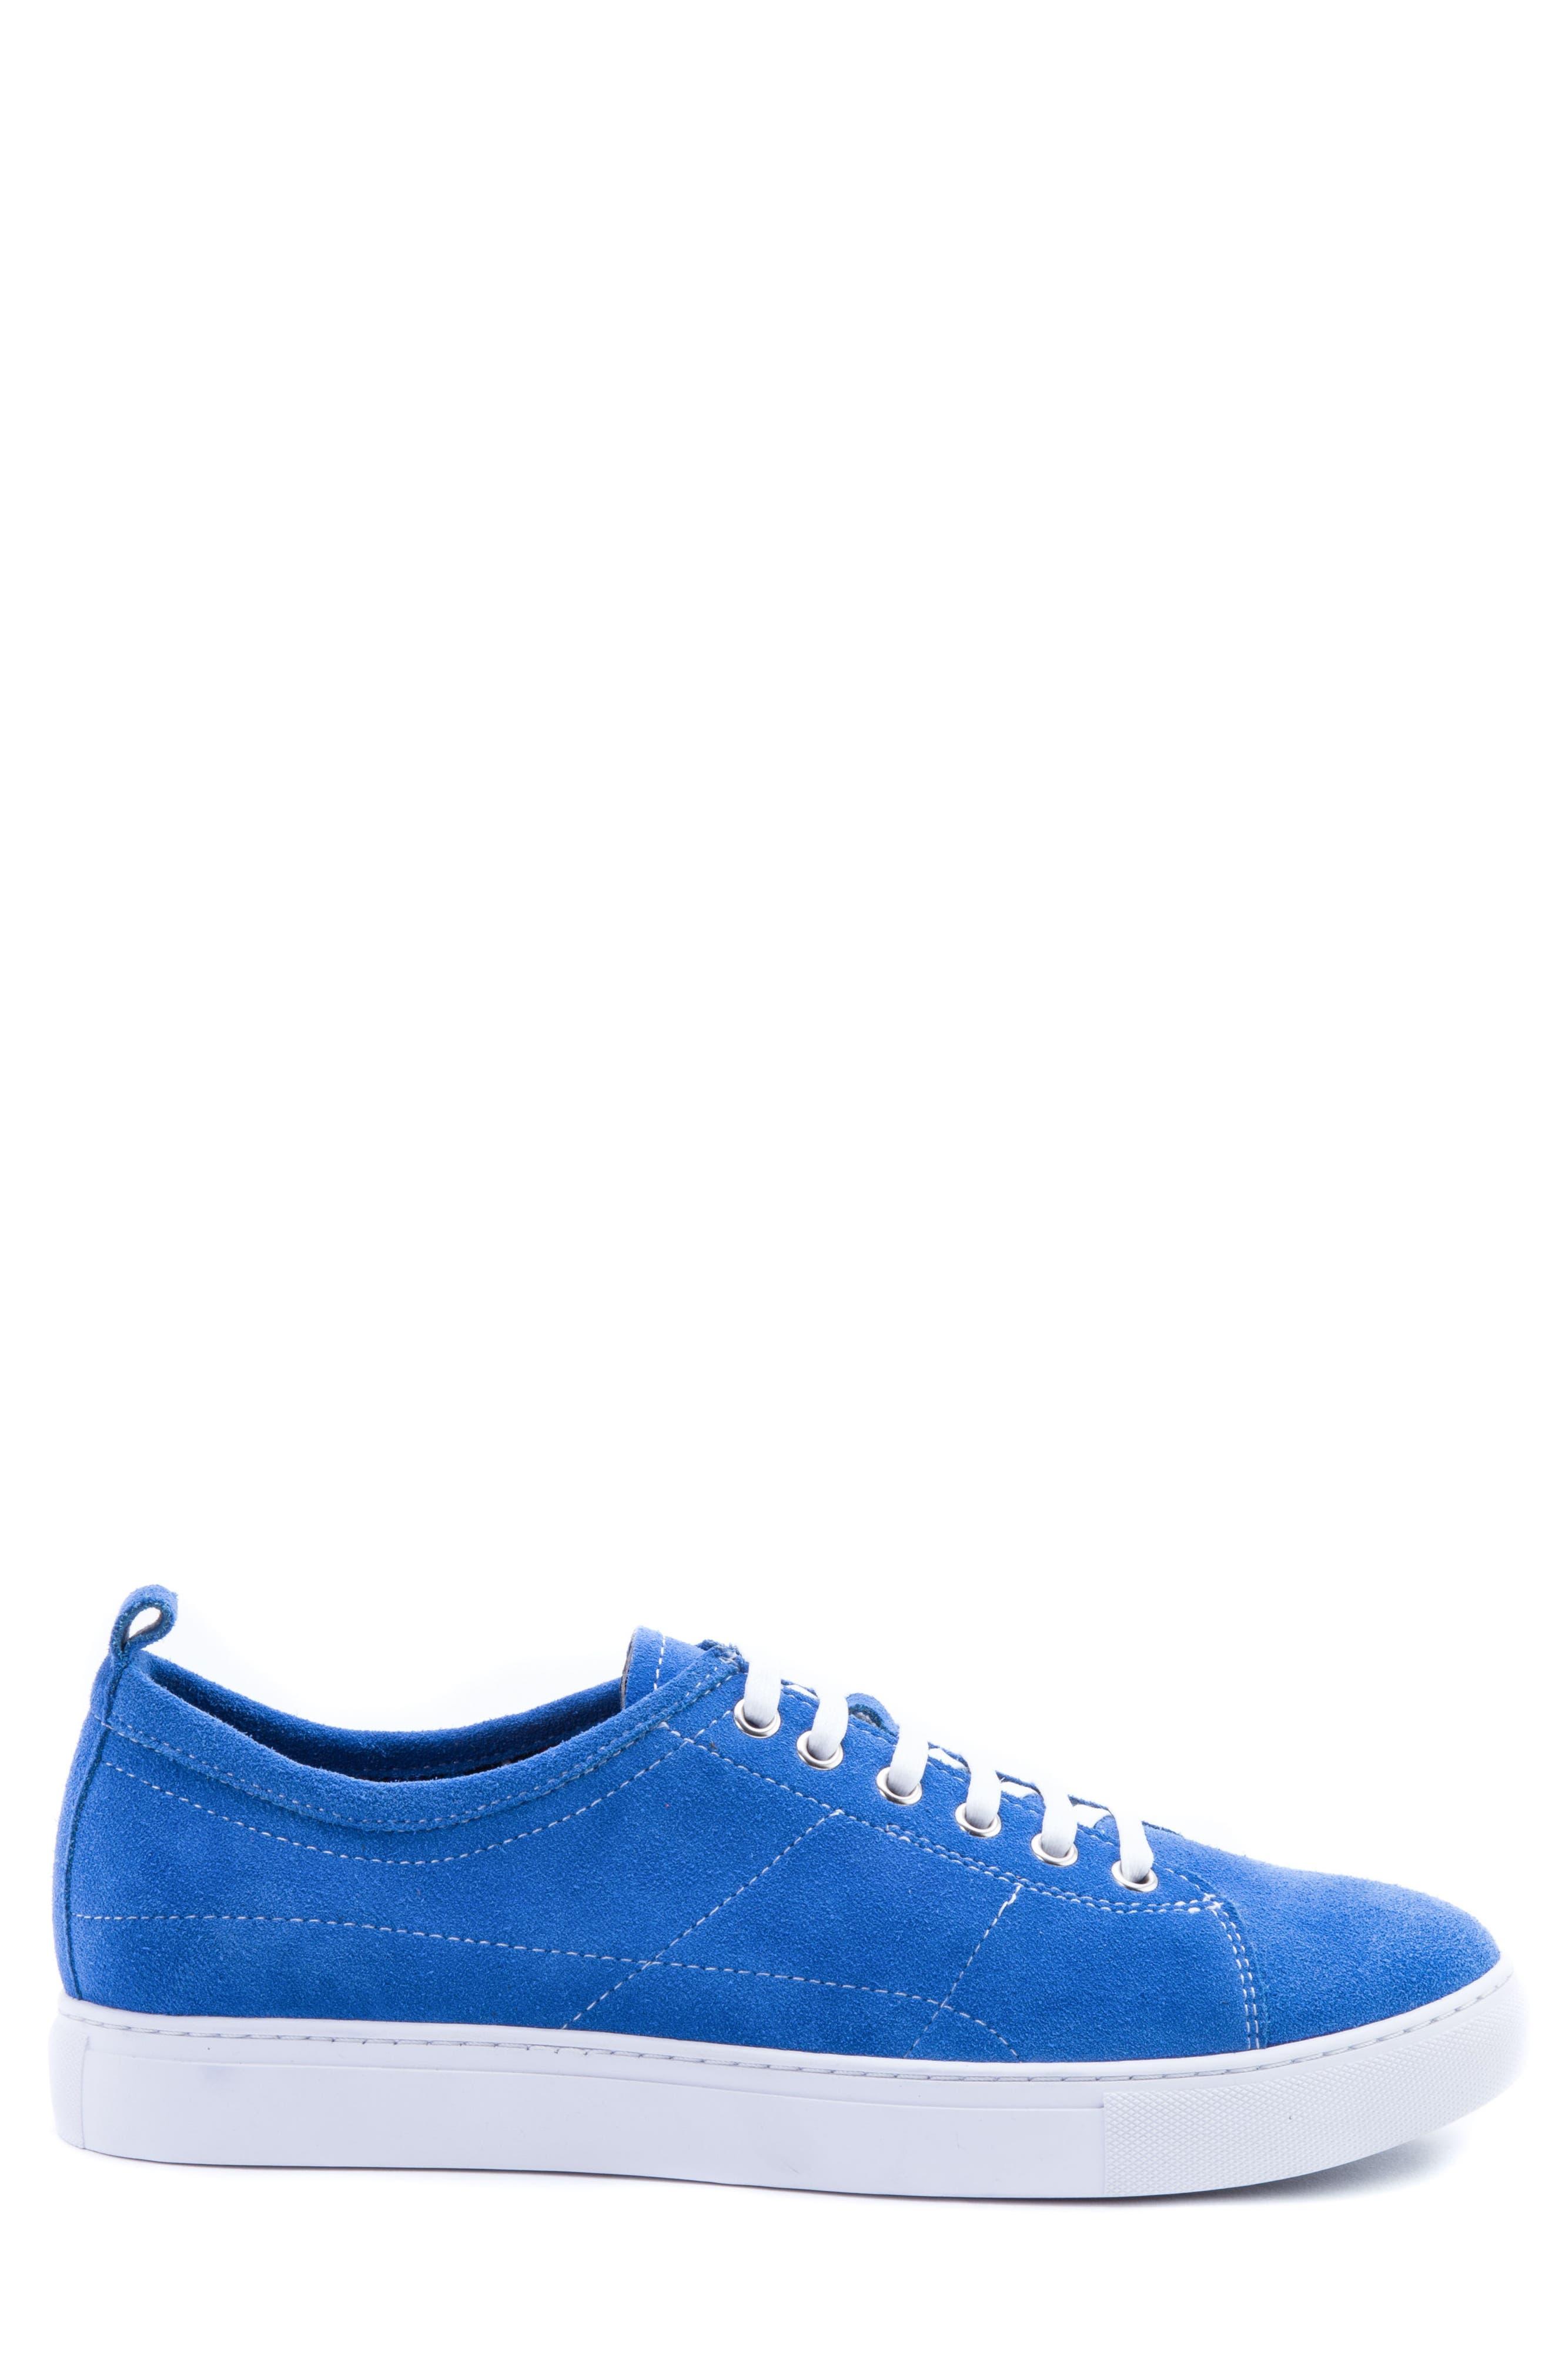 Ernesto Low Top Sneaker,                             Alternate thumbnail 3, color,                             ROYAL SUEDE